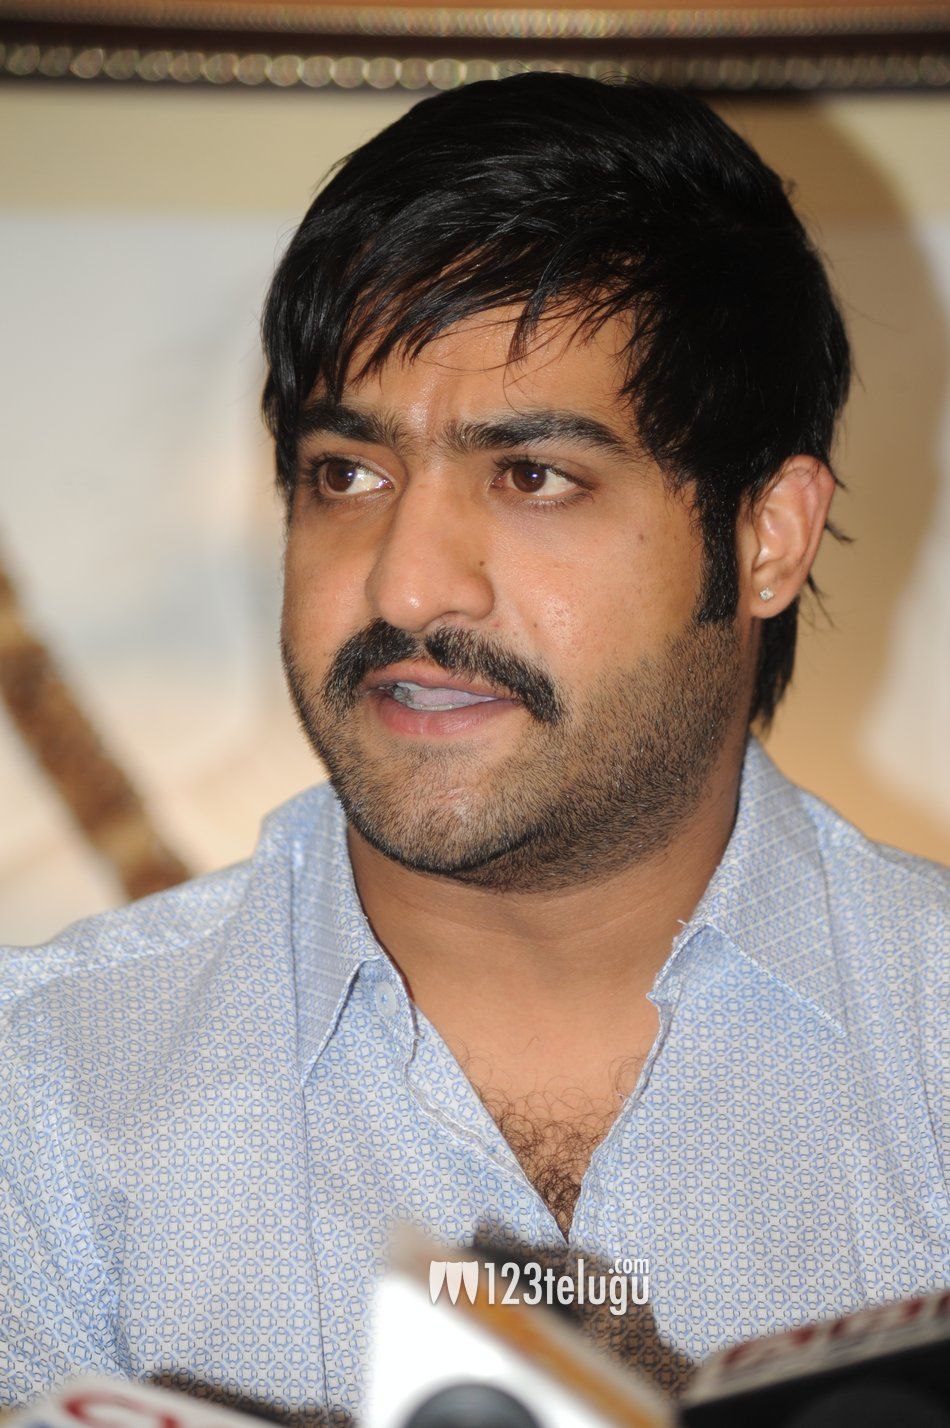 crazeemen: indian actor junior ntr with different hairstyle